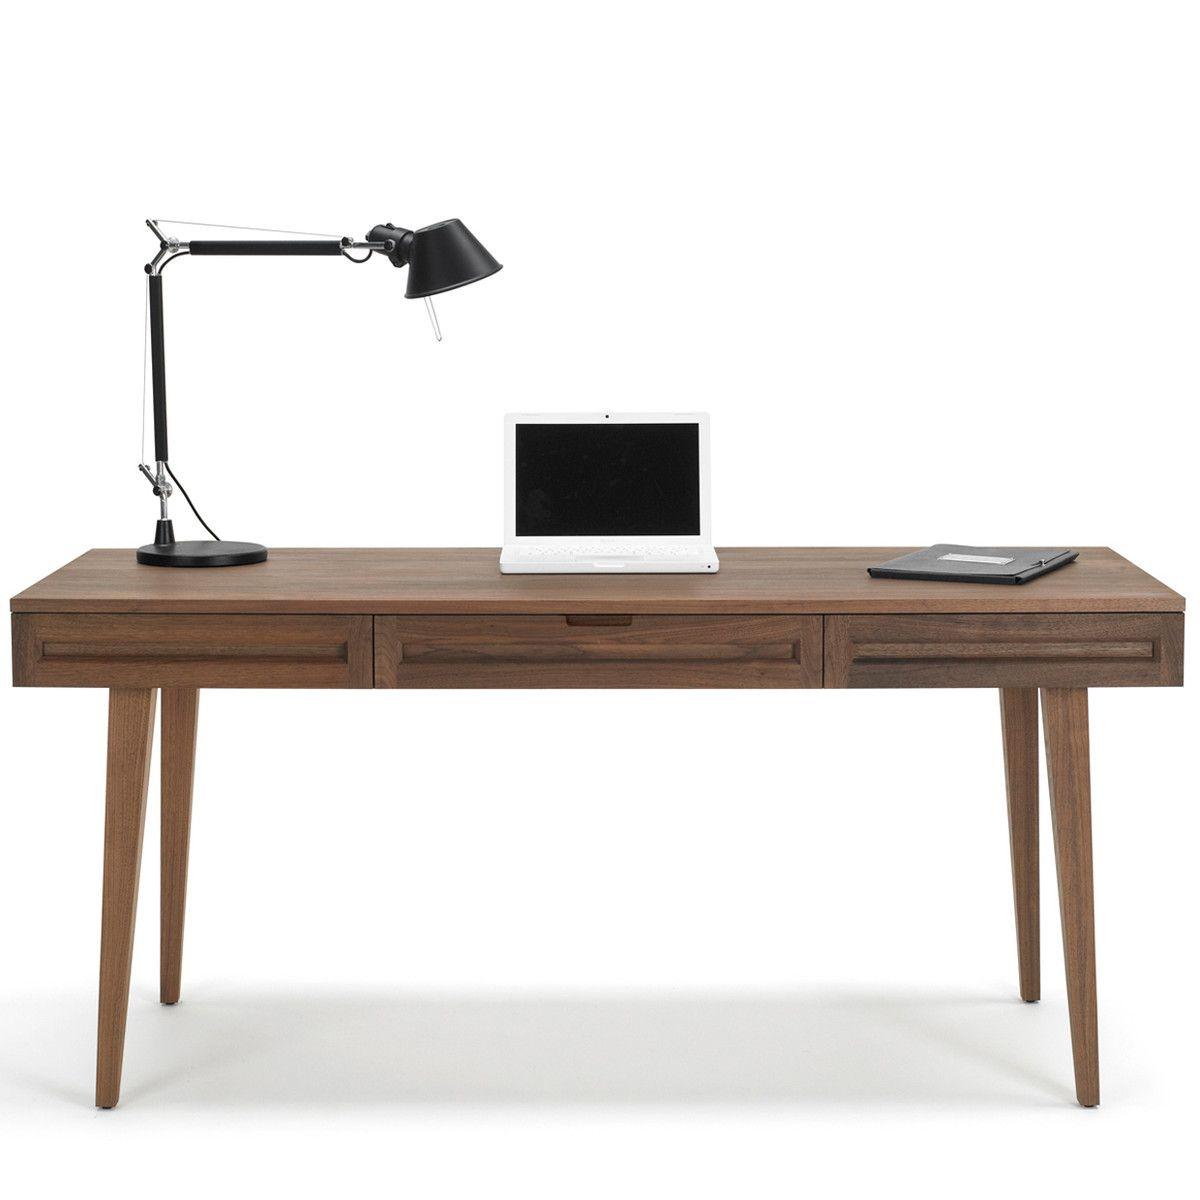 Highland Work Desk 64 Walnut By Theergooffice Solid Wood Desk Wood Desk Desk Furniture